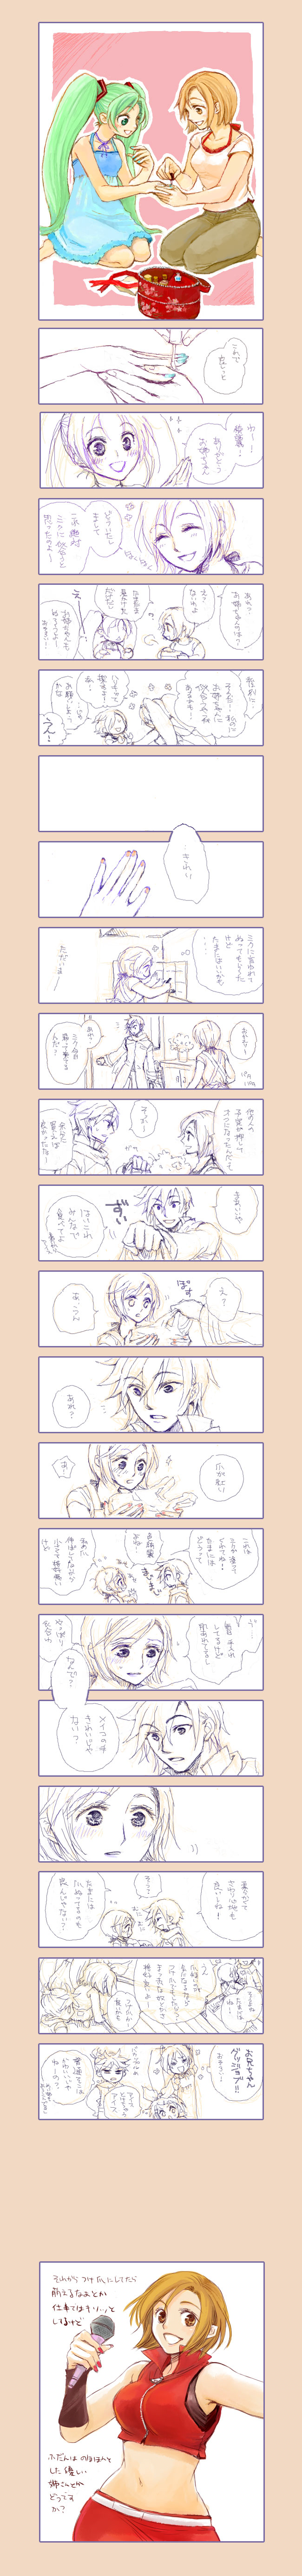 Tags: Anime, VOCALOID, MEIKO (VOCALOID), Hatsune Miku, KAITO, Kagamine Len, Kagamine Rin, Artist Request